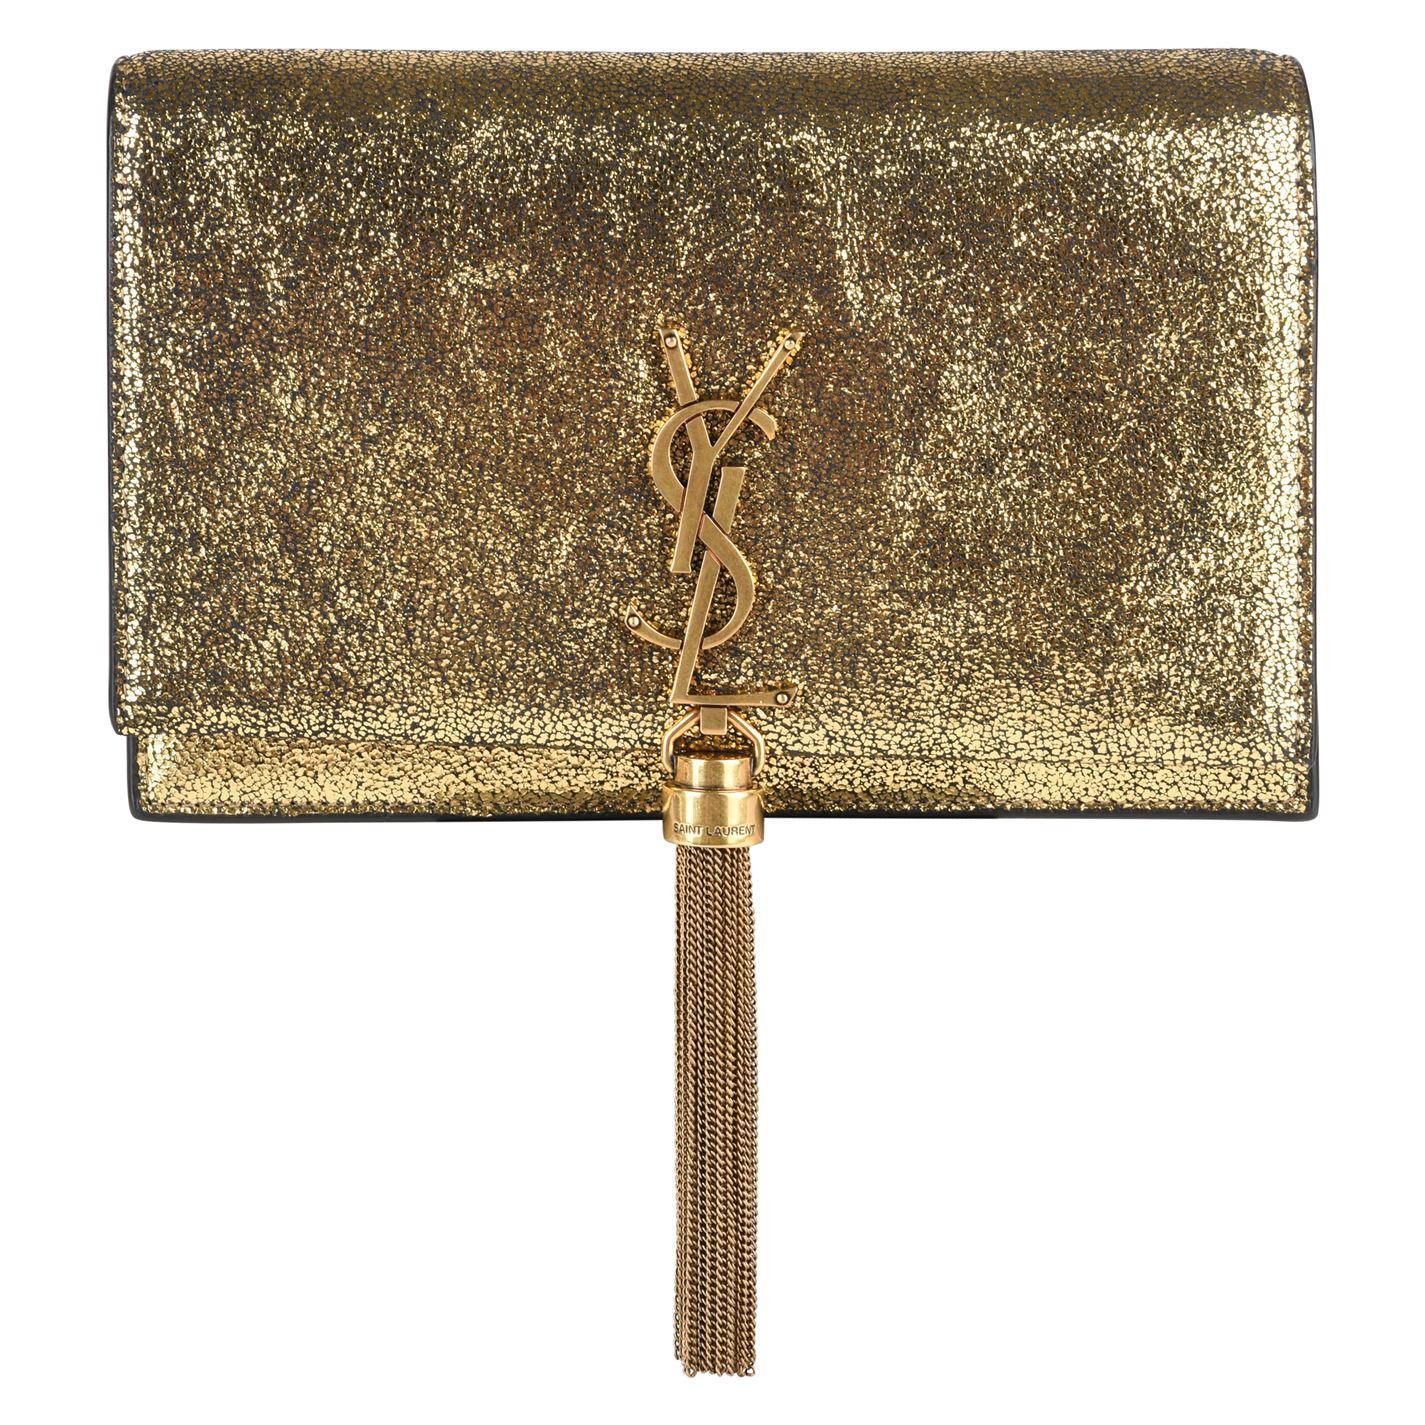 c16a4fe0bc Saint Laurent - Metallic Tassel Chain Shoulder Wallet Bag - Lyst. View  fullscreen